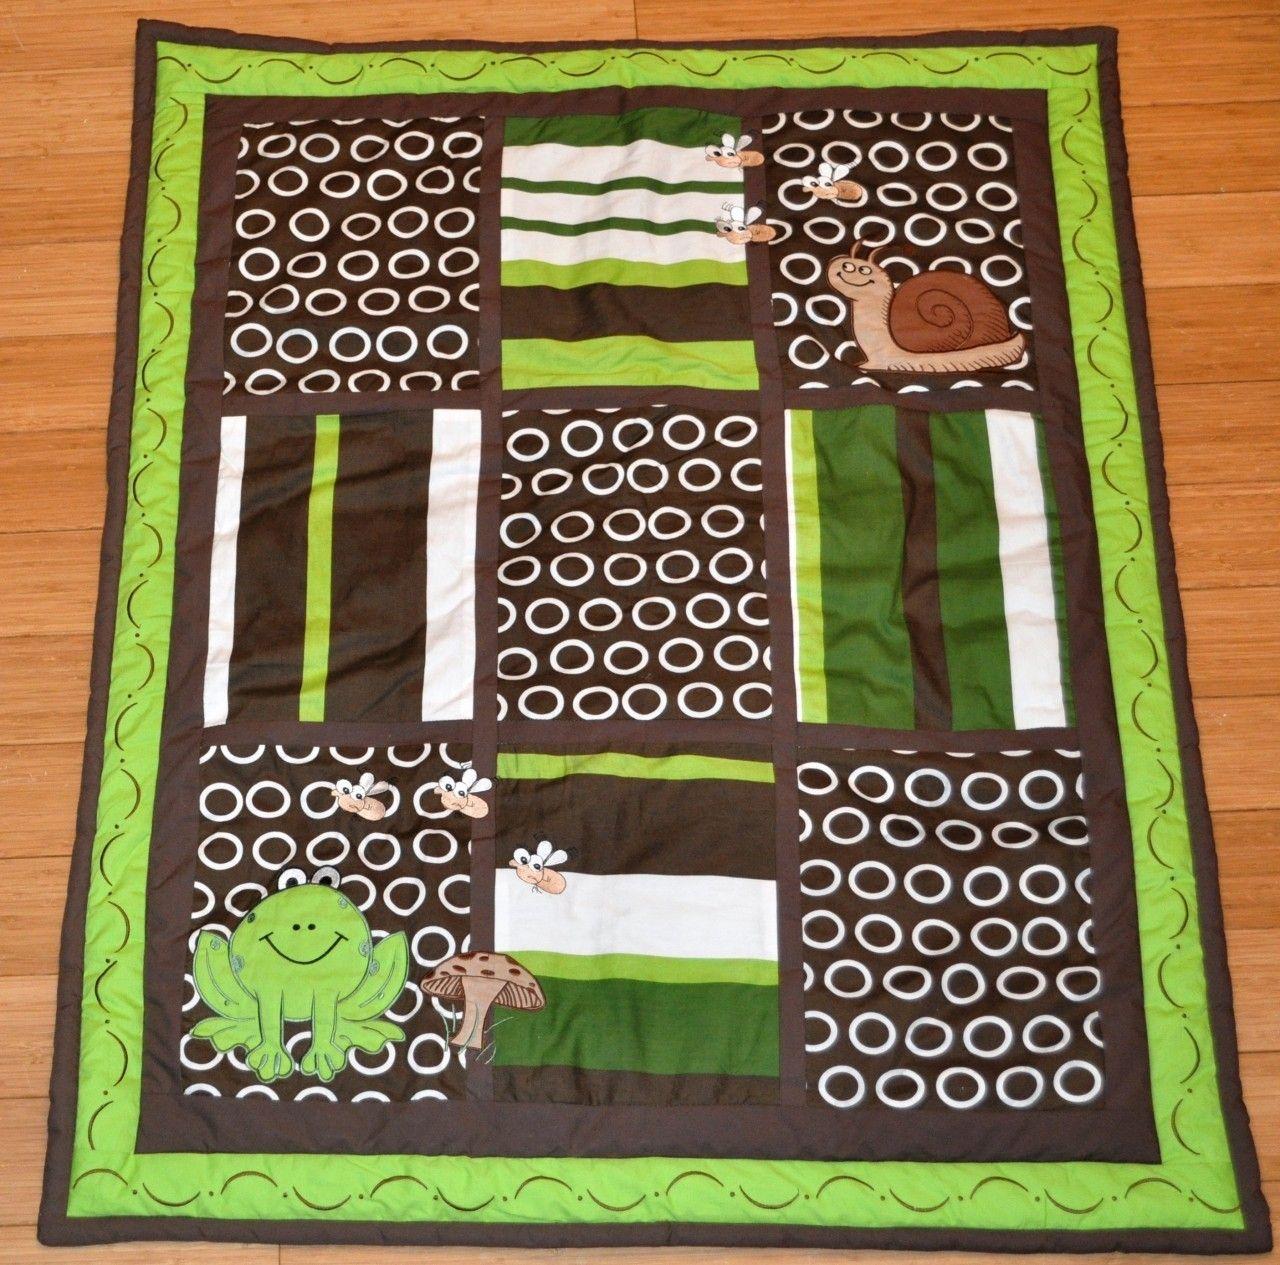 full 10 piece cute green frog design baby crib bedding by dk leigh nursery designs. Black Bedroom Furniture Sets. Home Design Ideas